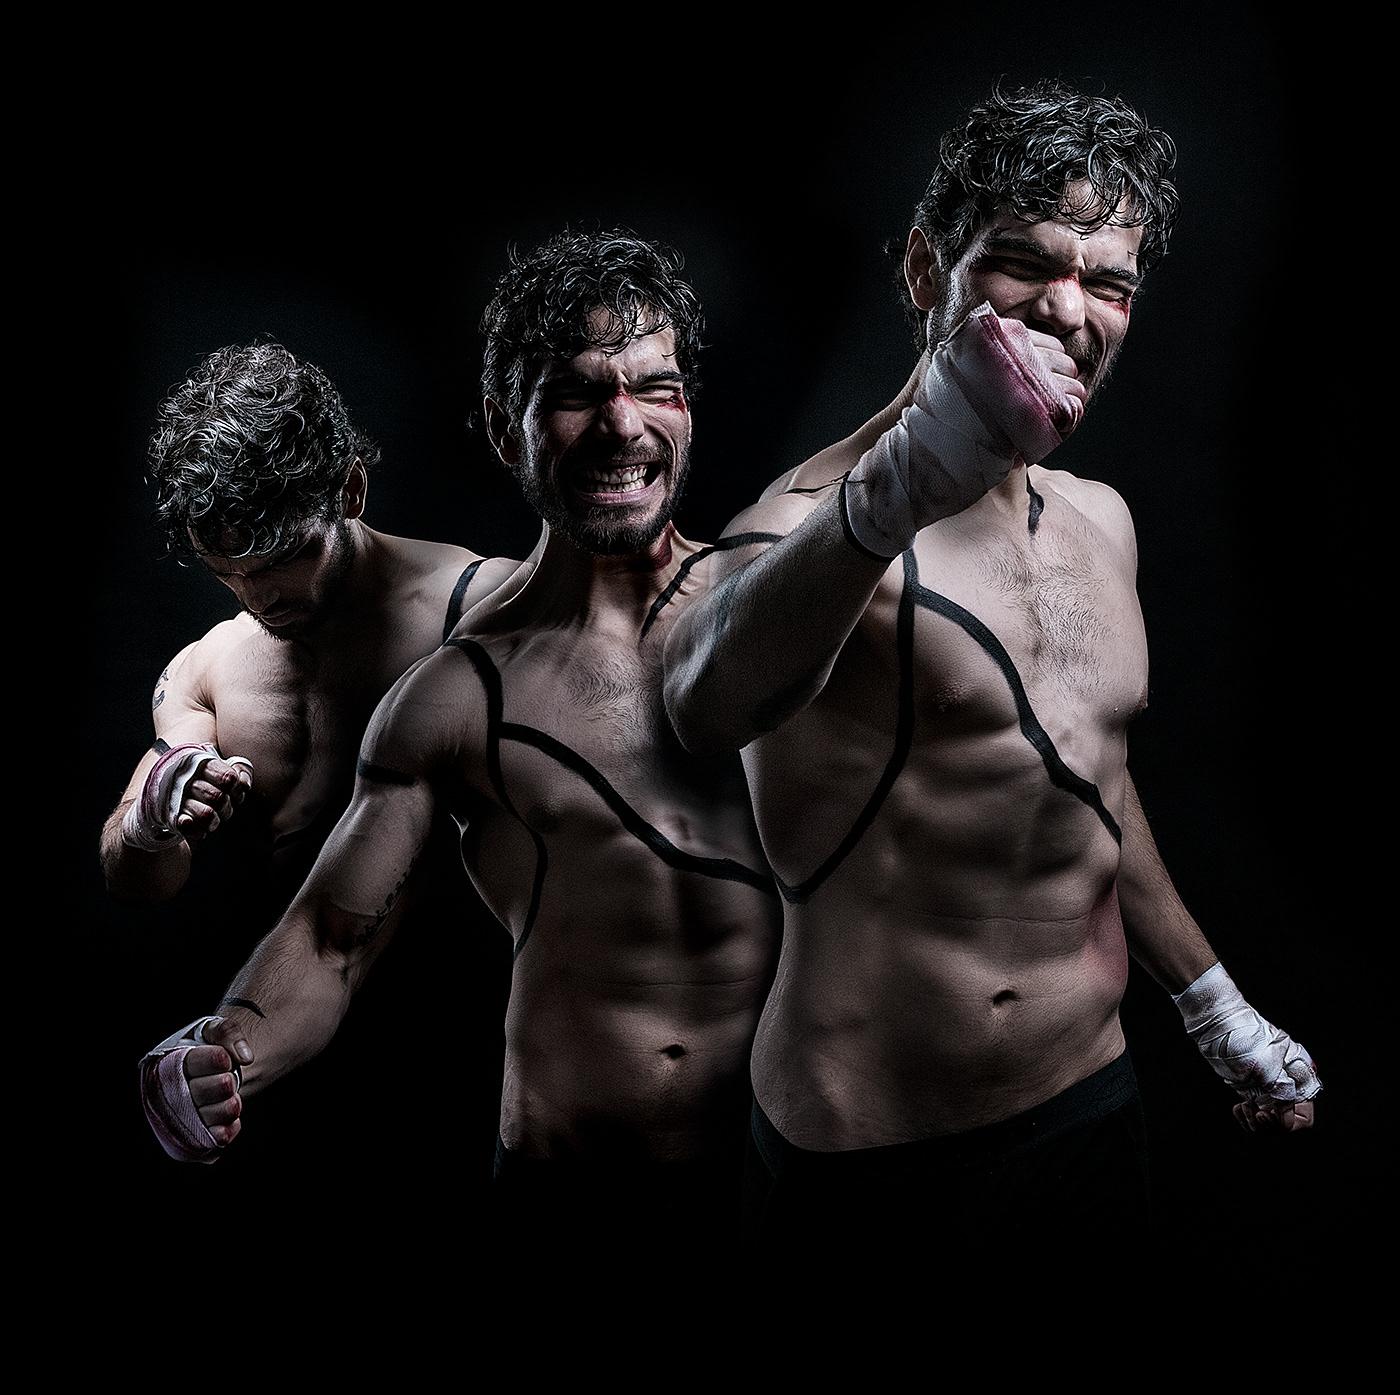 fight Fighter male model photographer fight club MUMBAI India fashion shoot portflio